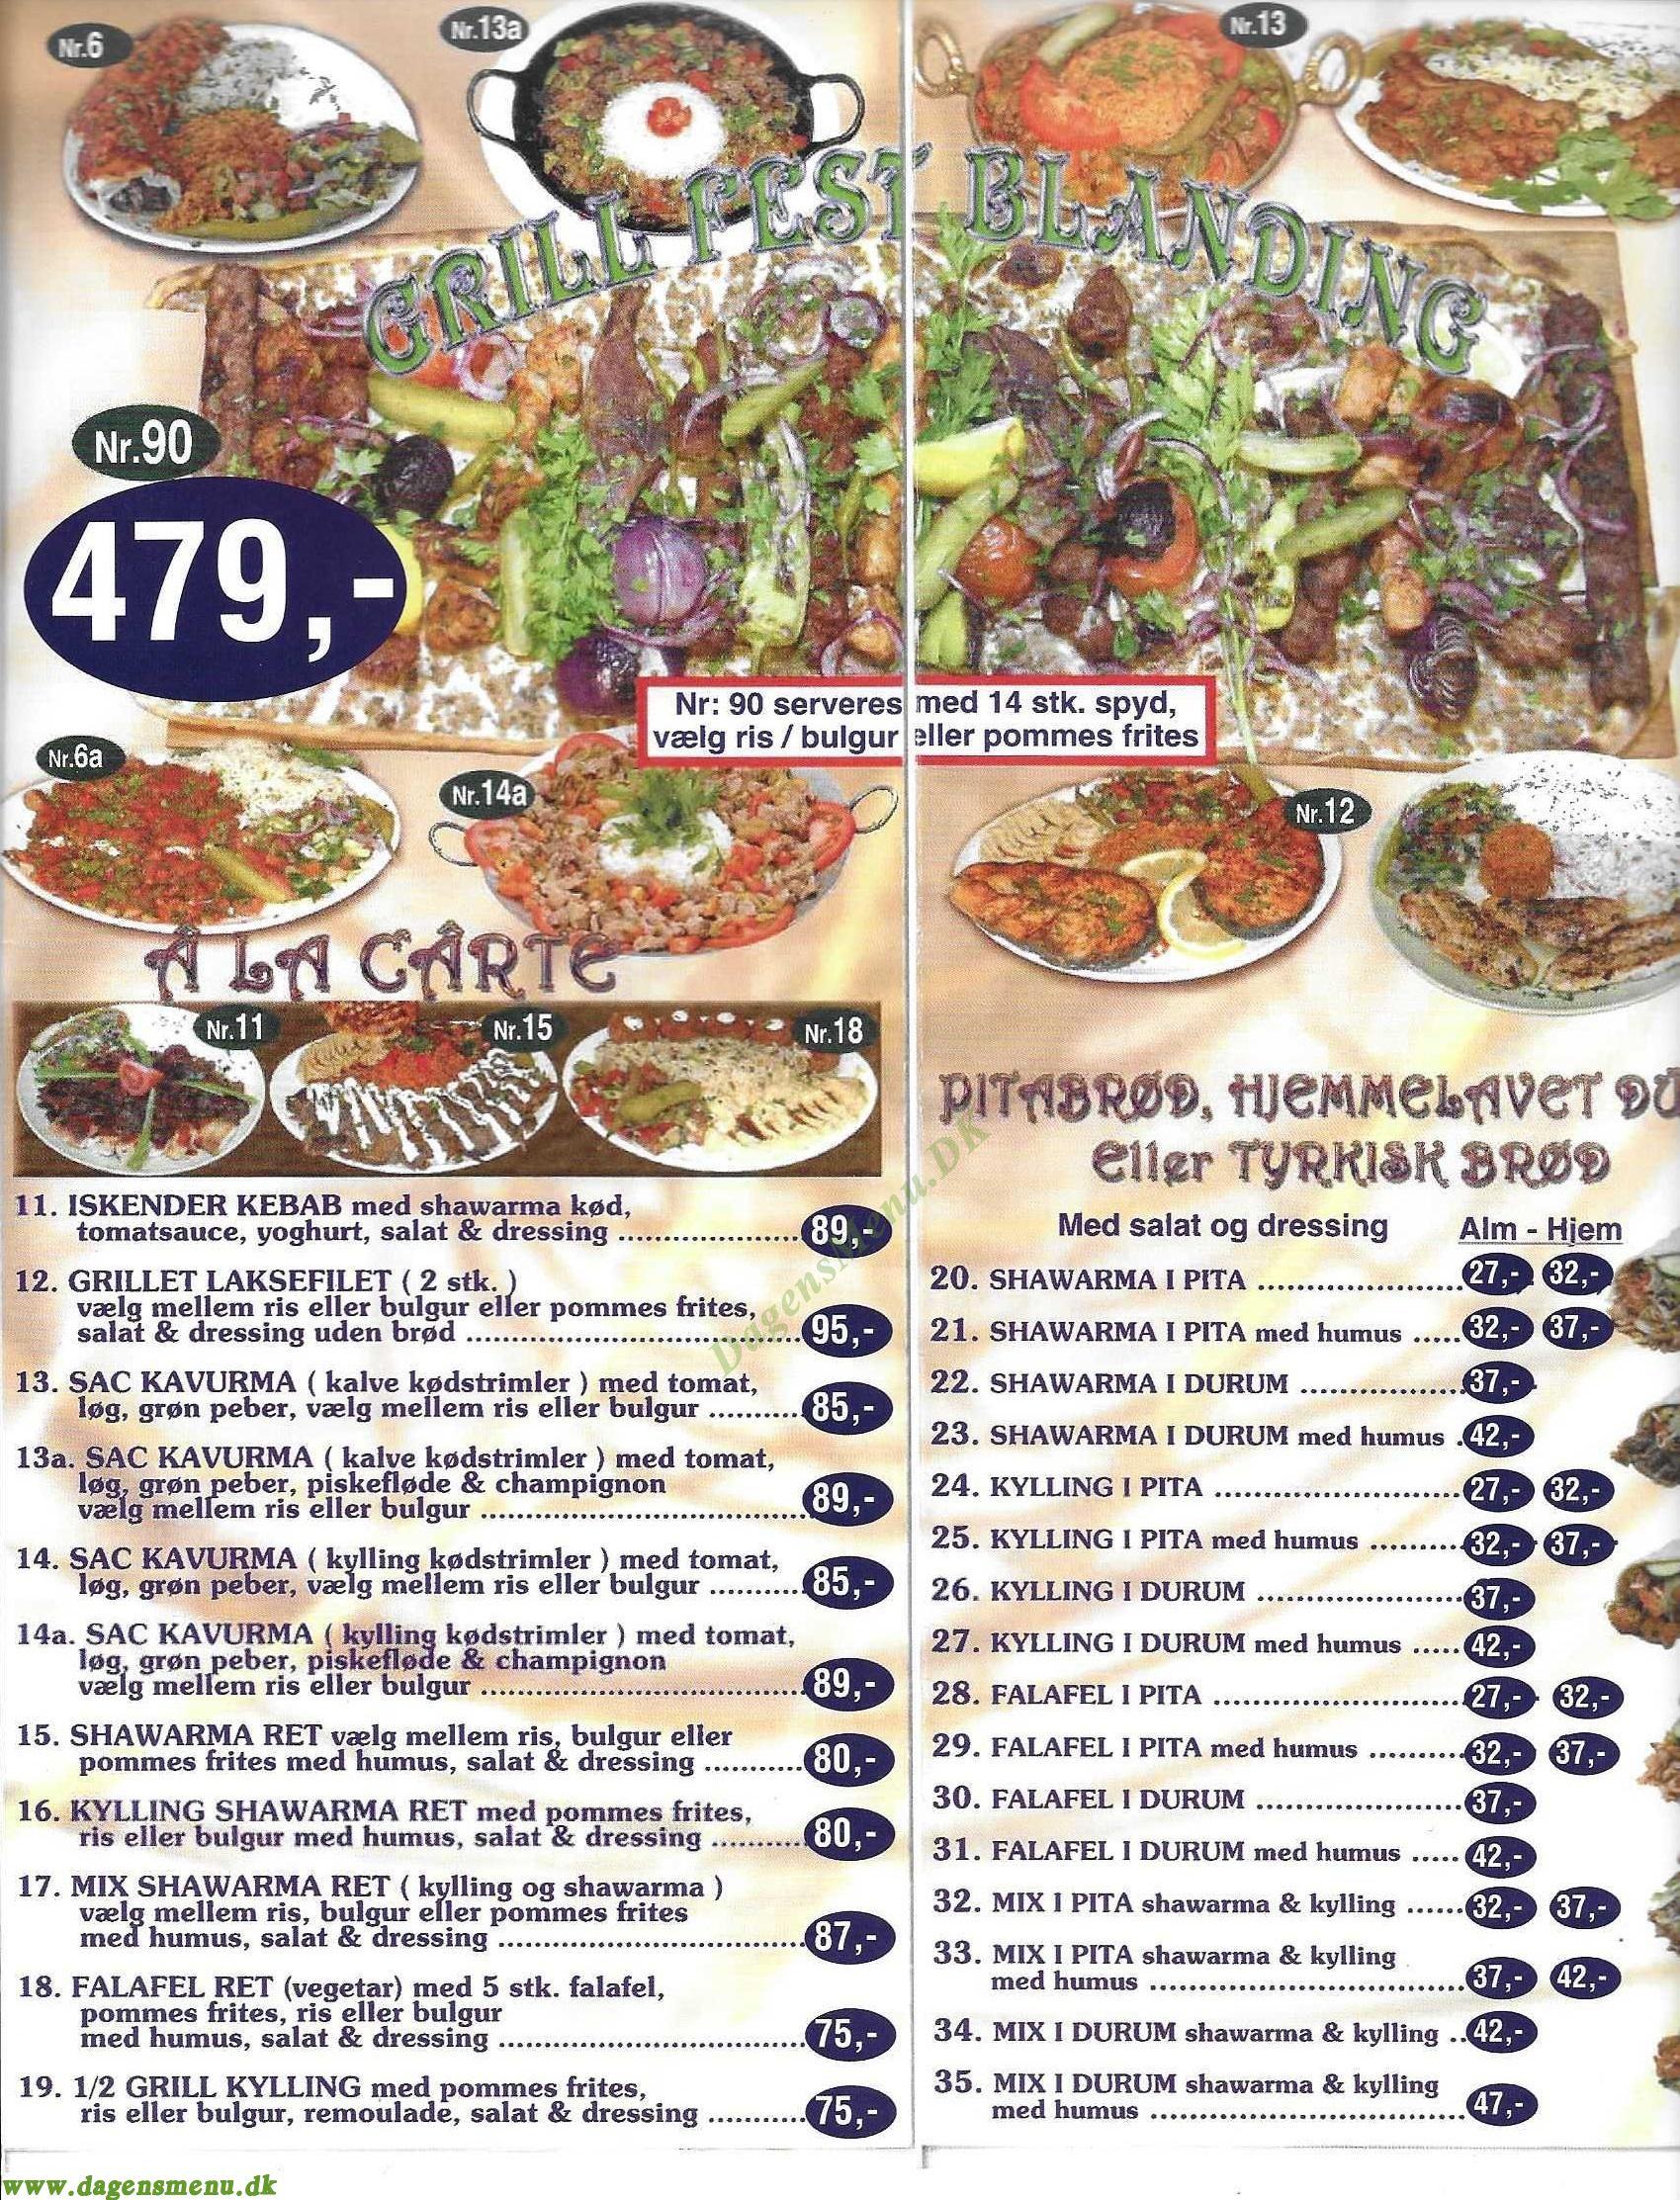 Alanya 2 Restaurant - Menukort